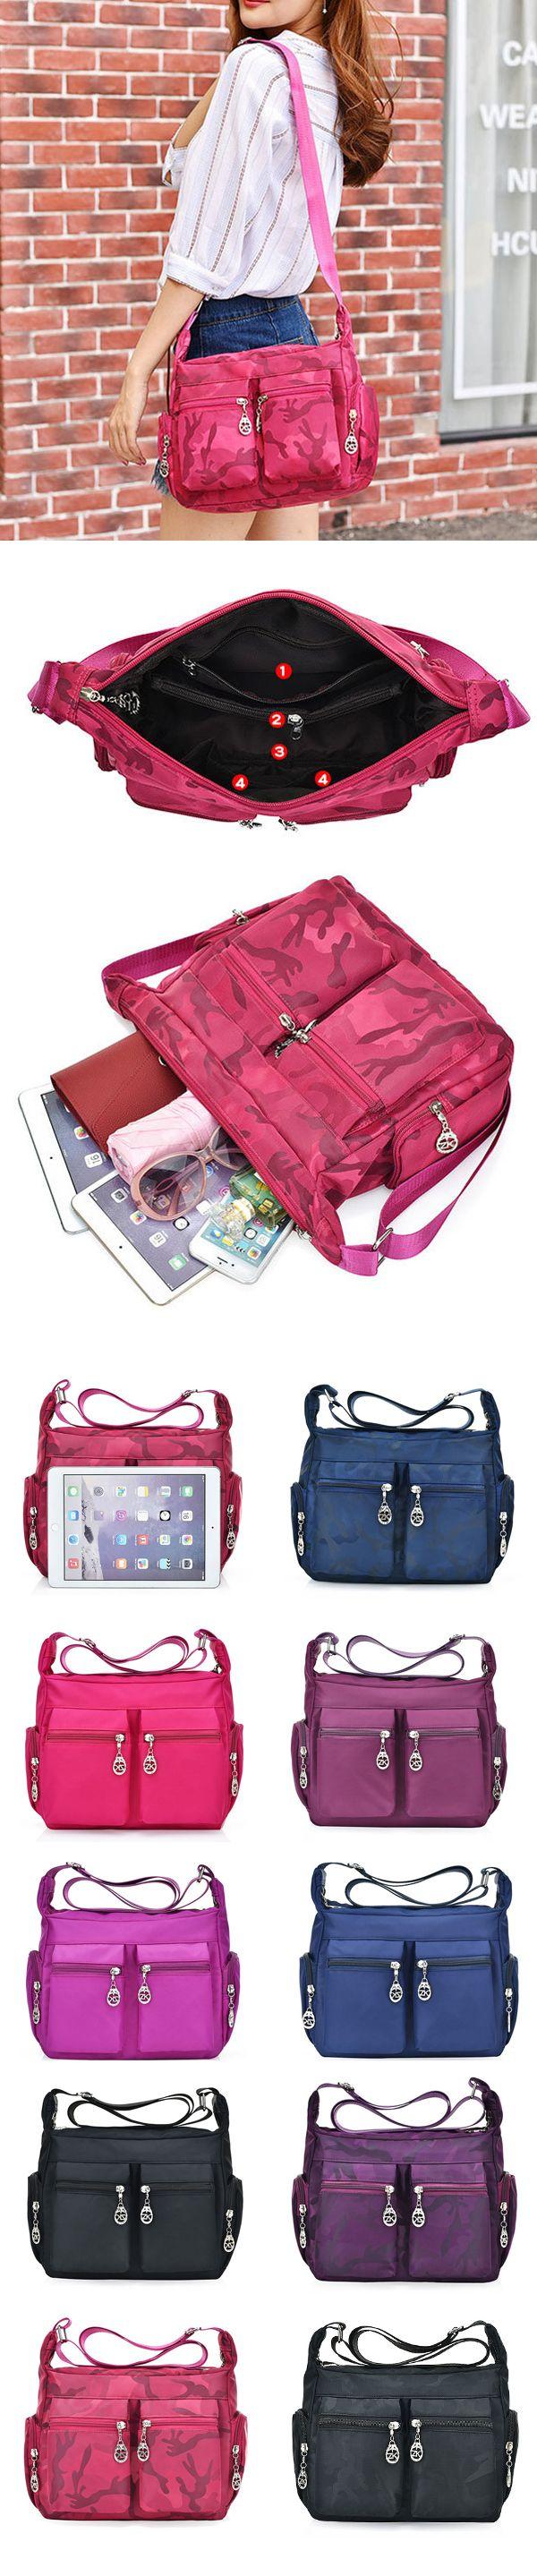 [$ 15.36]   Multi-pockets Nylon Waterproof Outdoor Crossbody Bag Shoulder Bag For Women